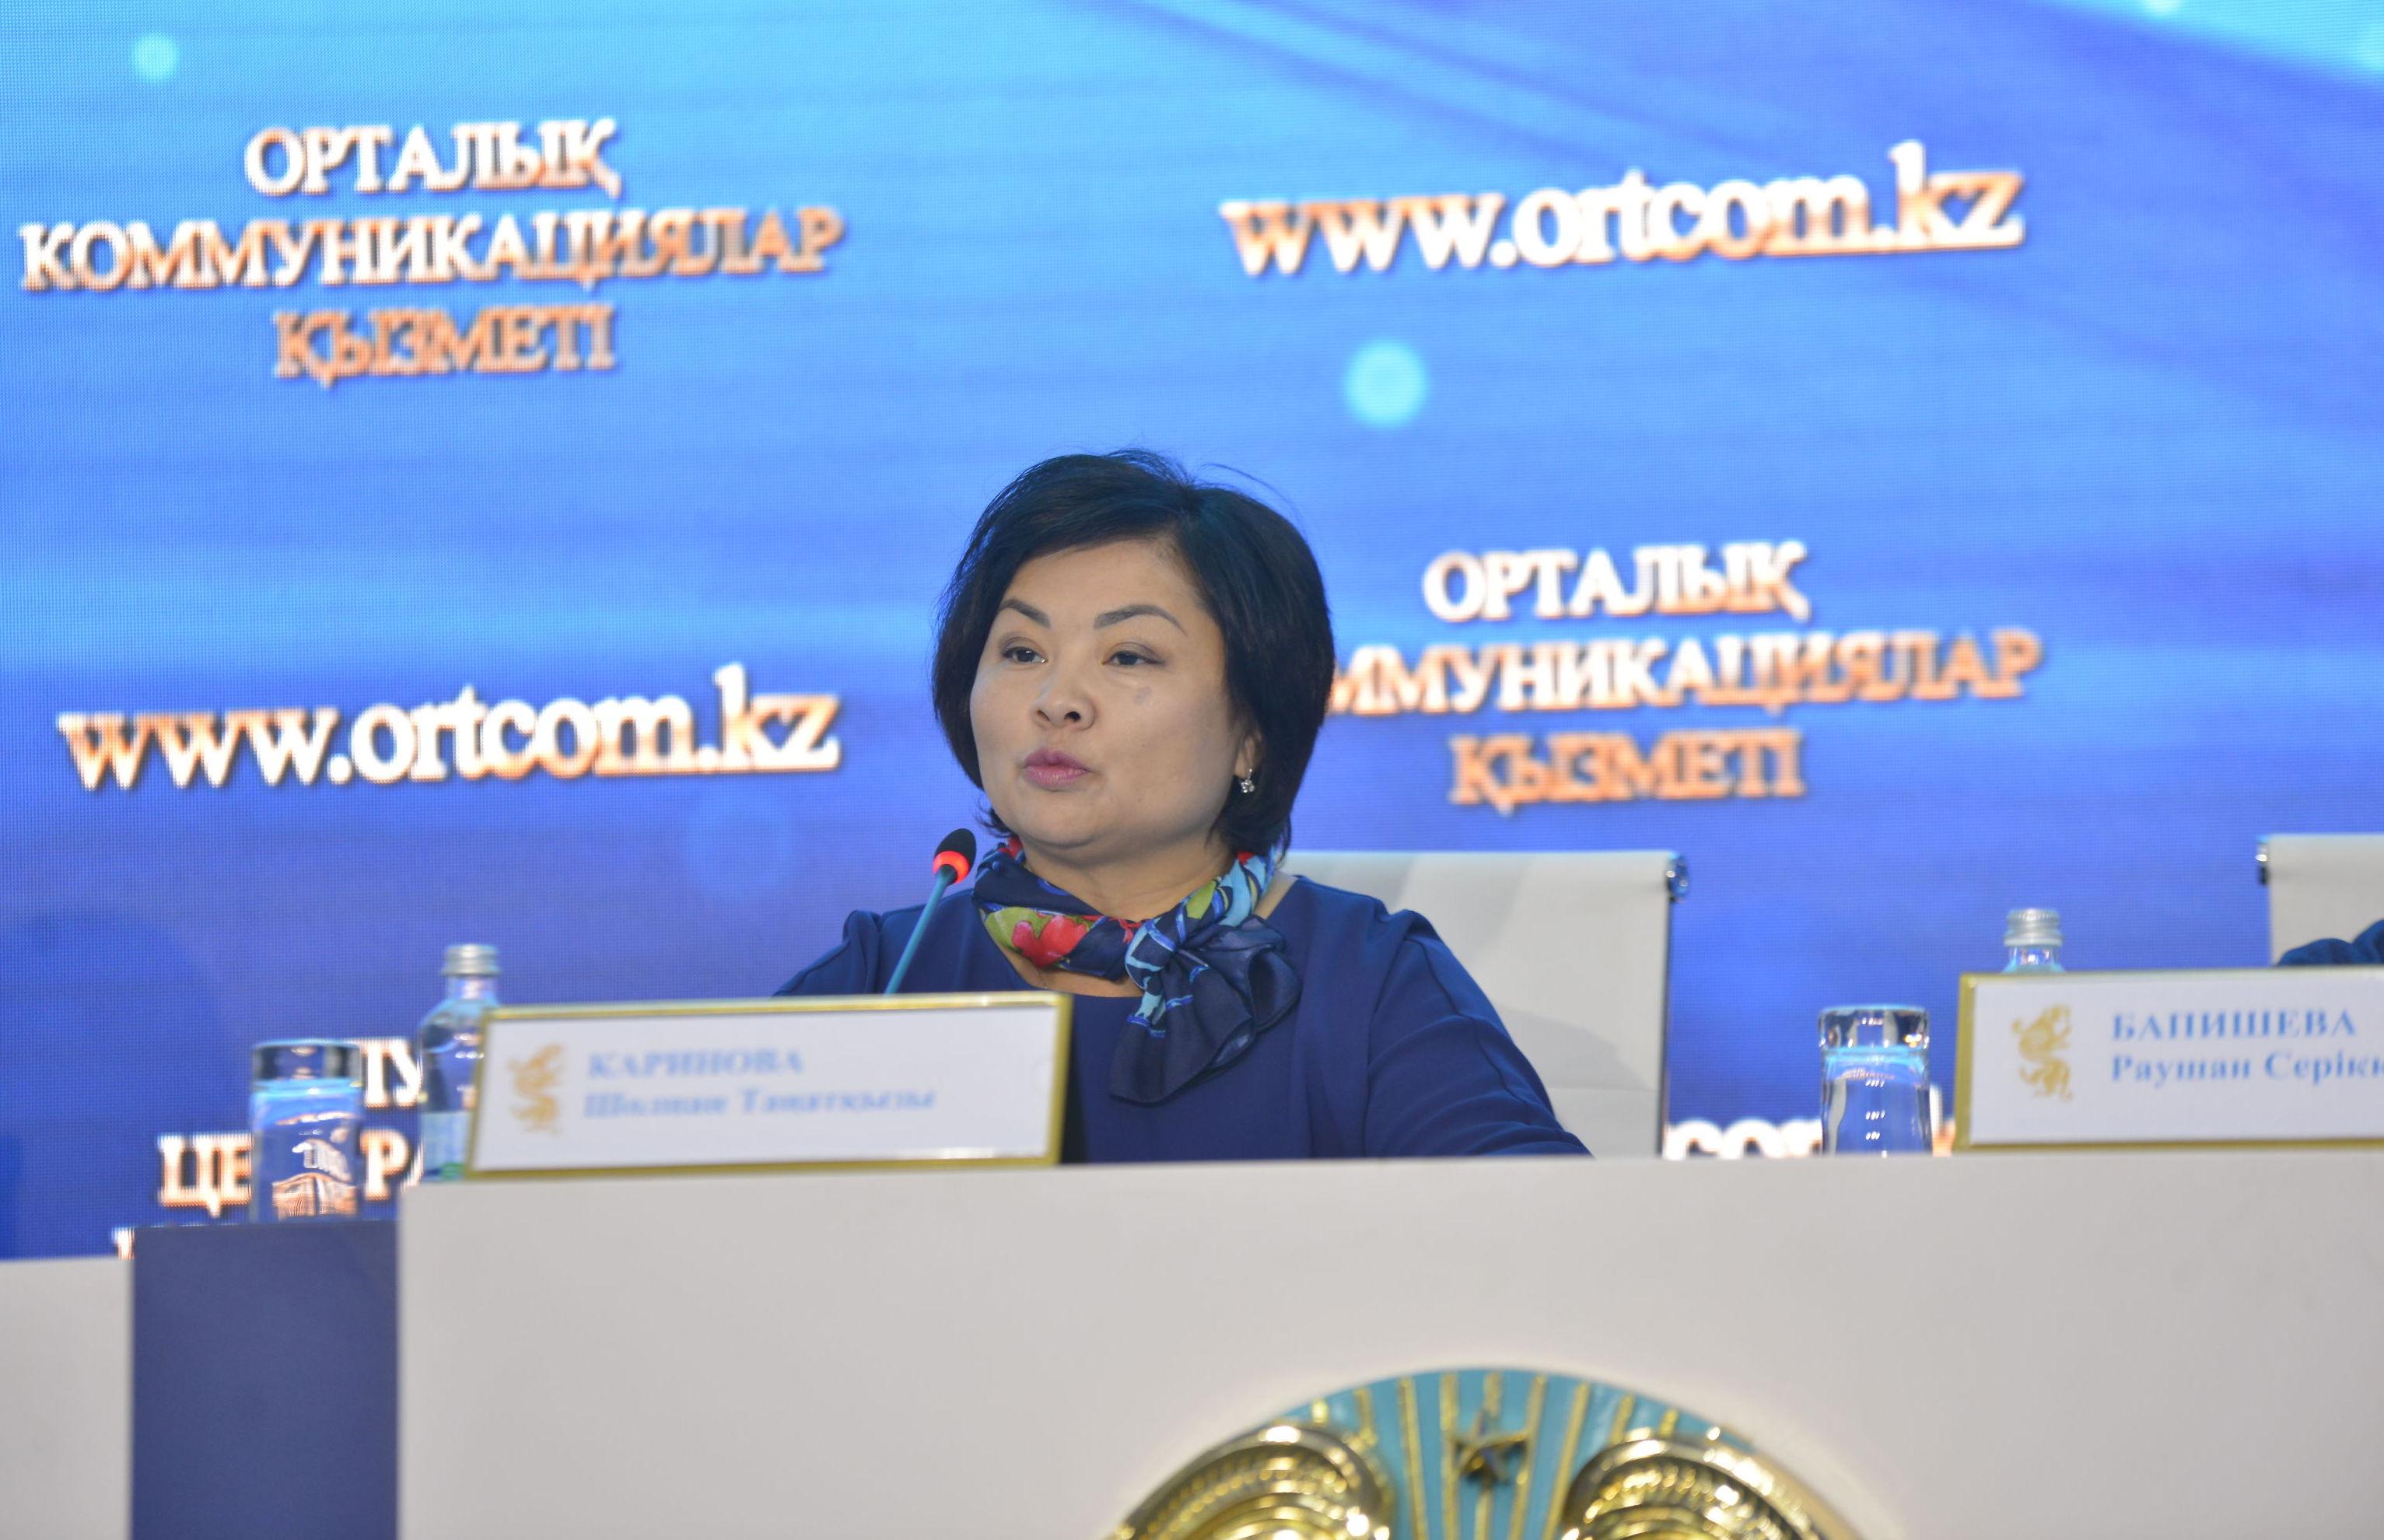 Вице-министр образования и науки Казахстана Шолпан Каринова